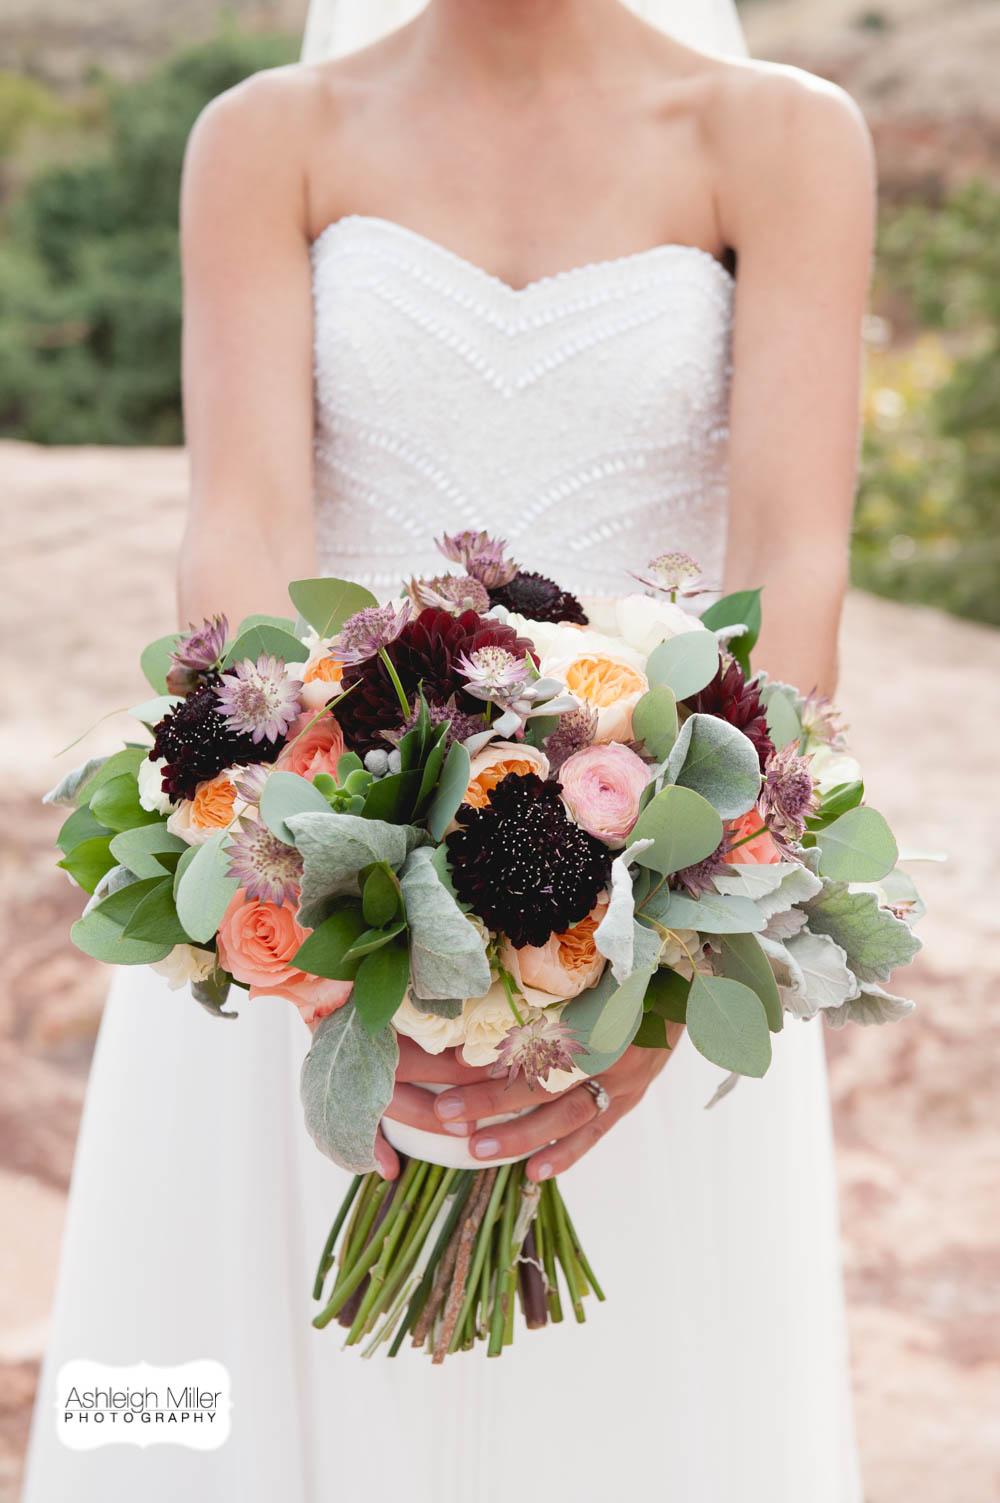 AMW-Wedding-EmilyRyan-WillowRidgeManor-3820-Blog.jpg